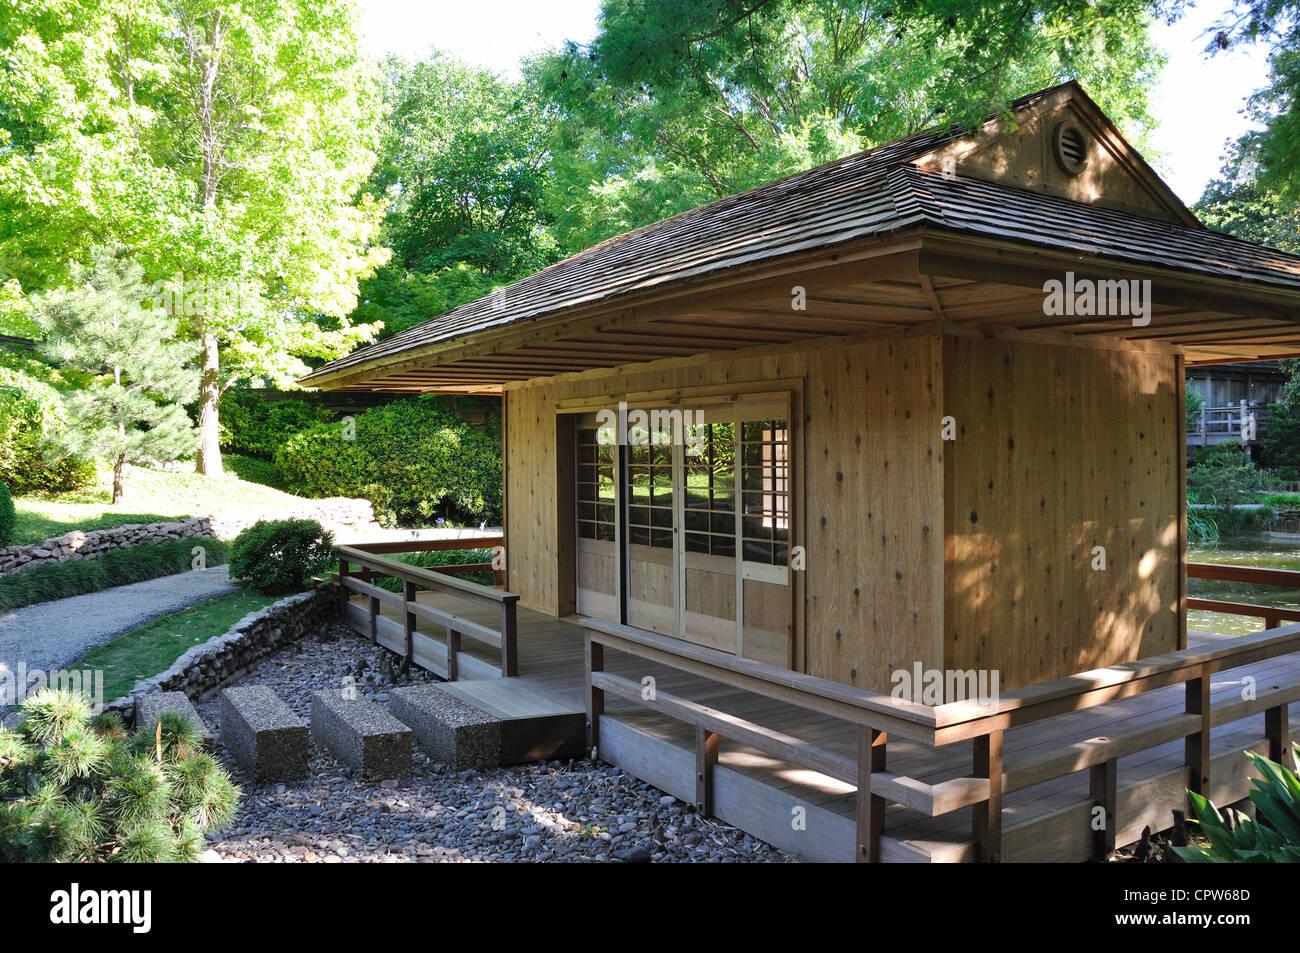 Japanese Garden, Fort Worth, Texas, USA Stock Photo: 48496909 - Alamy